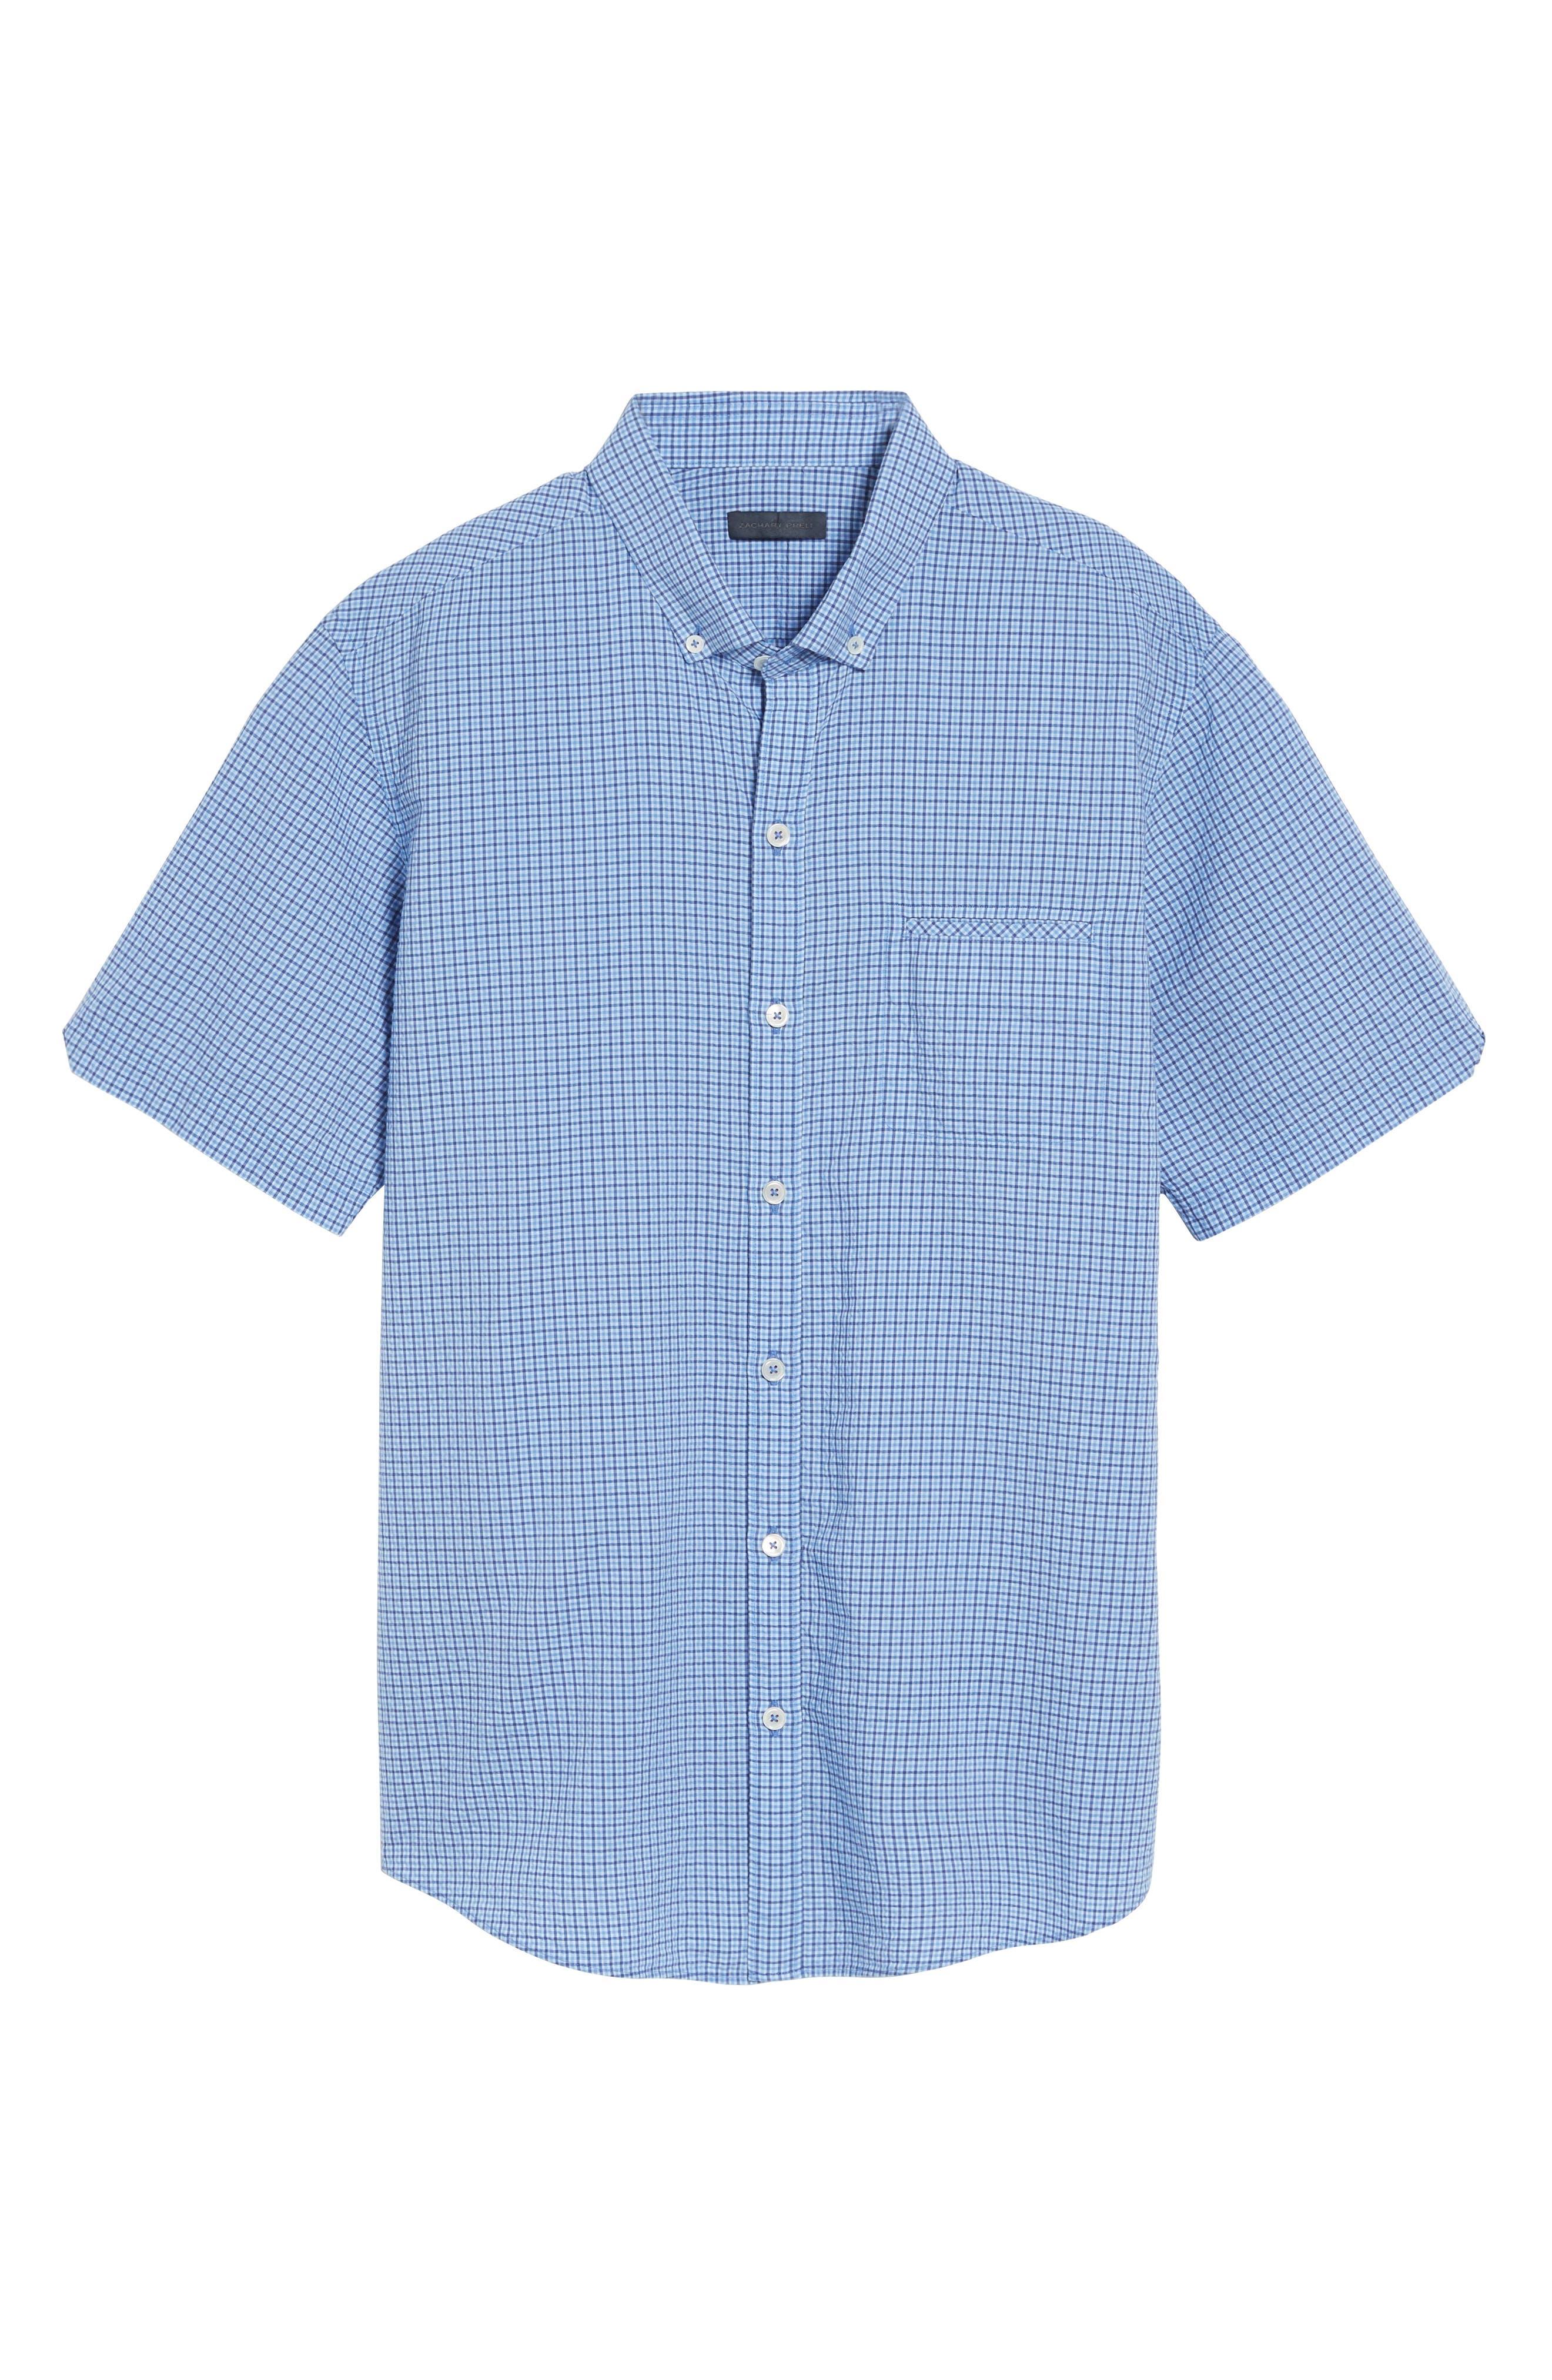 Short Sleeve Sport Shirt,                             Alternate thumbnail 6, color,                             Teal